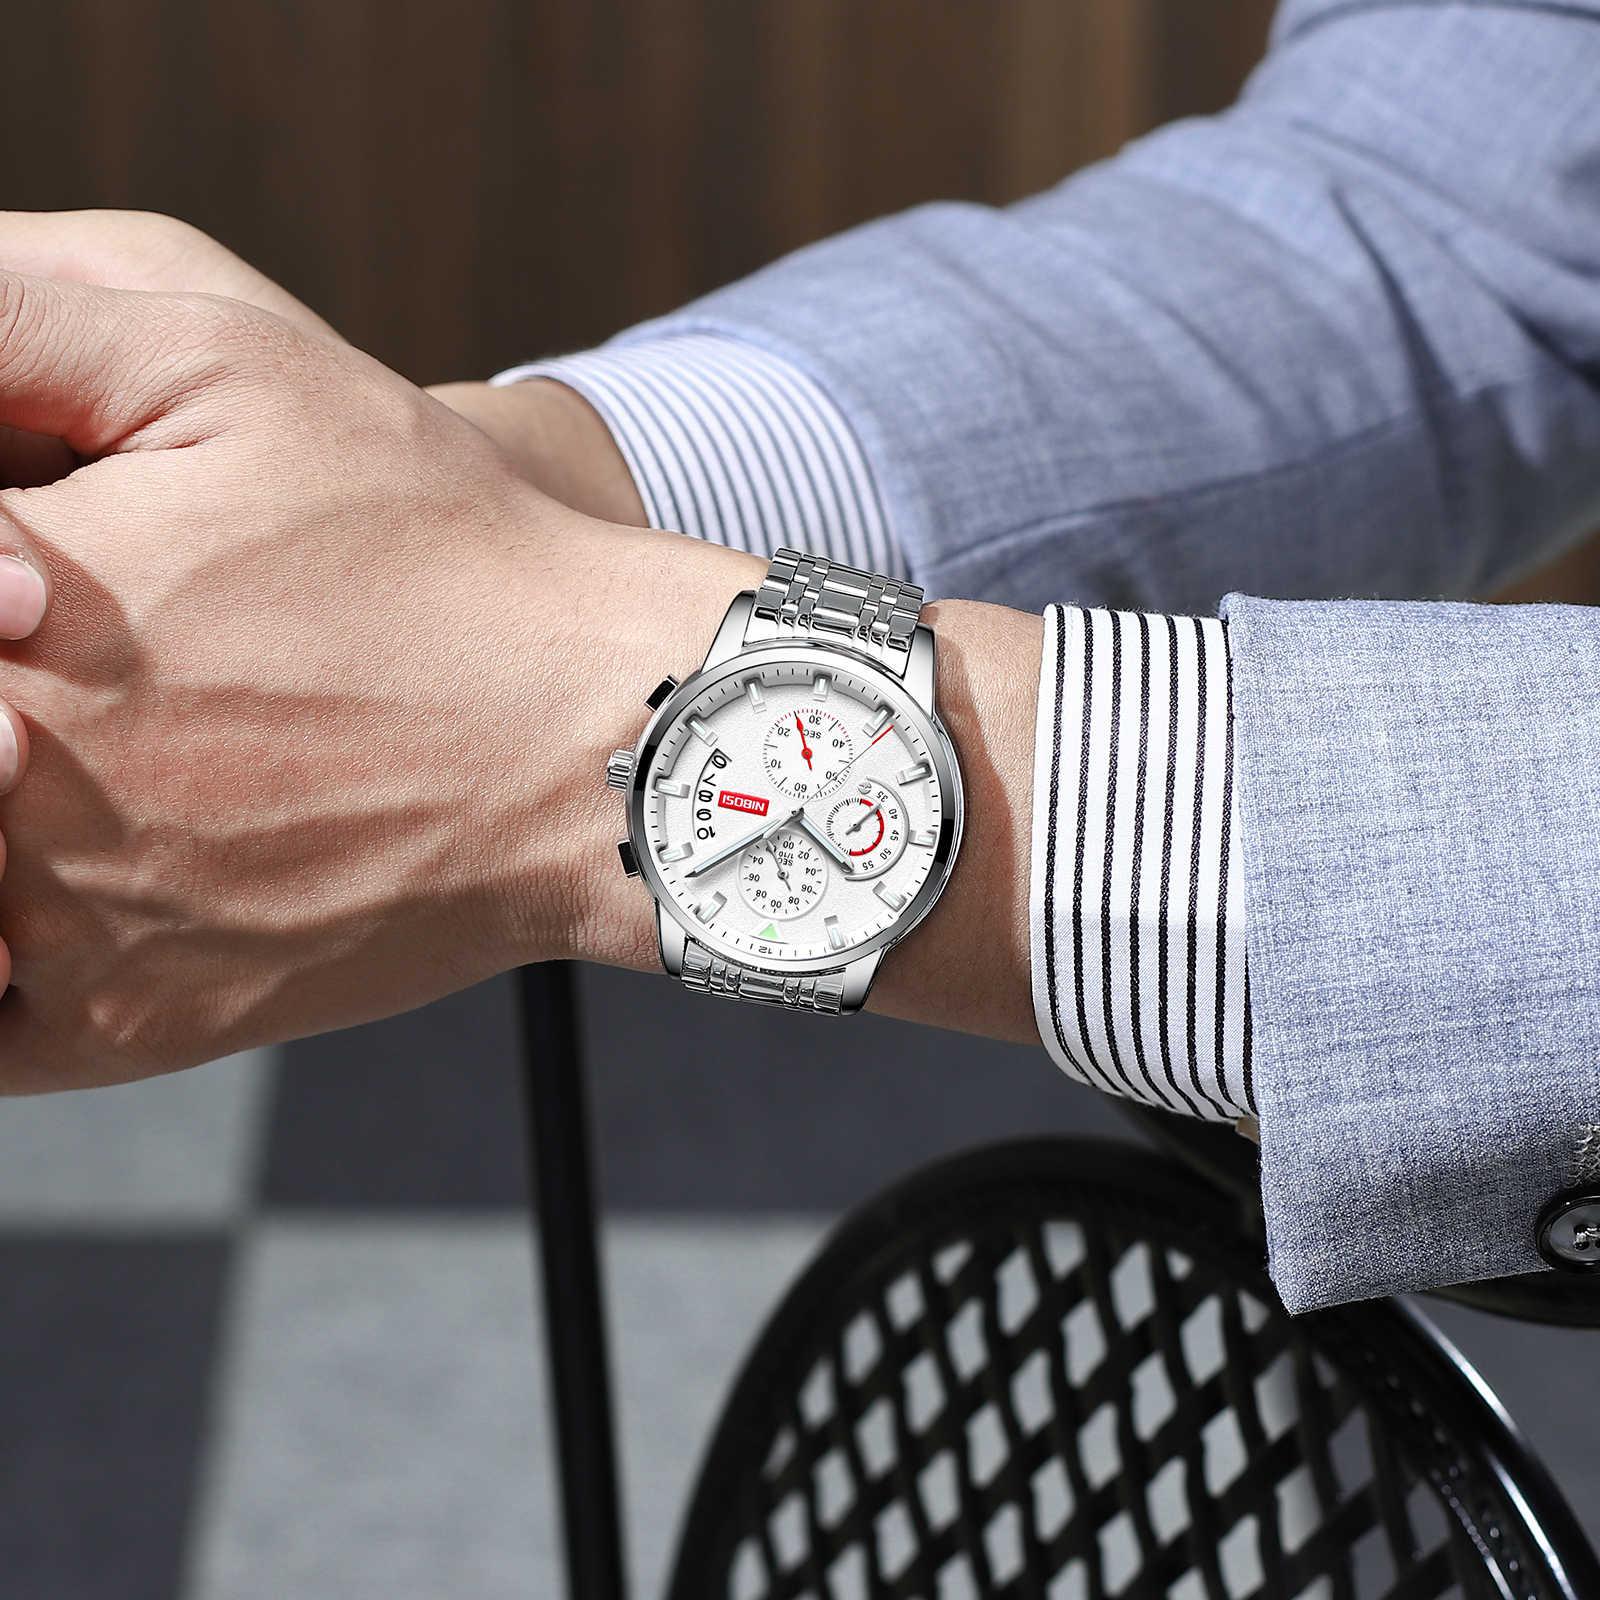 Relogio Masculino NIBOSI 2019 חדש Mens שעונים למעלה מותג יוקרה סטופר ספורט עמיד למים קוורץ איש עסקי אופנה שעון